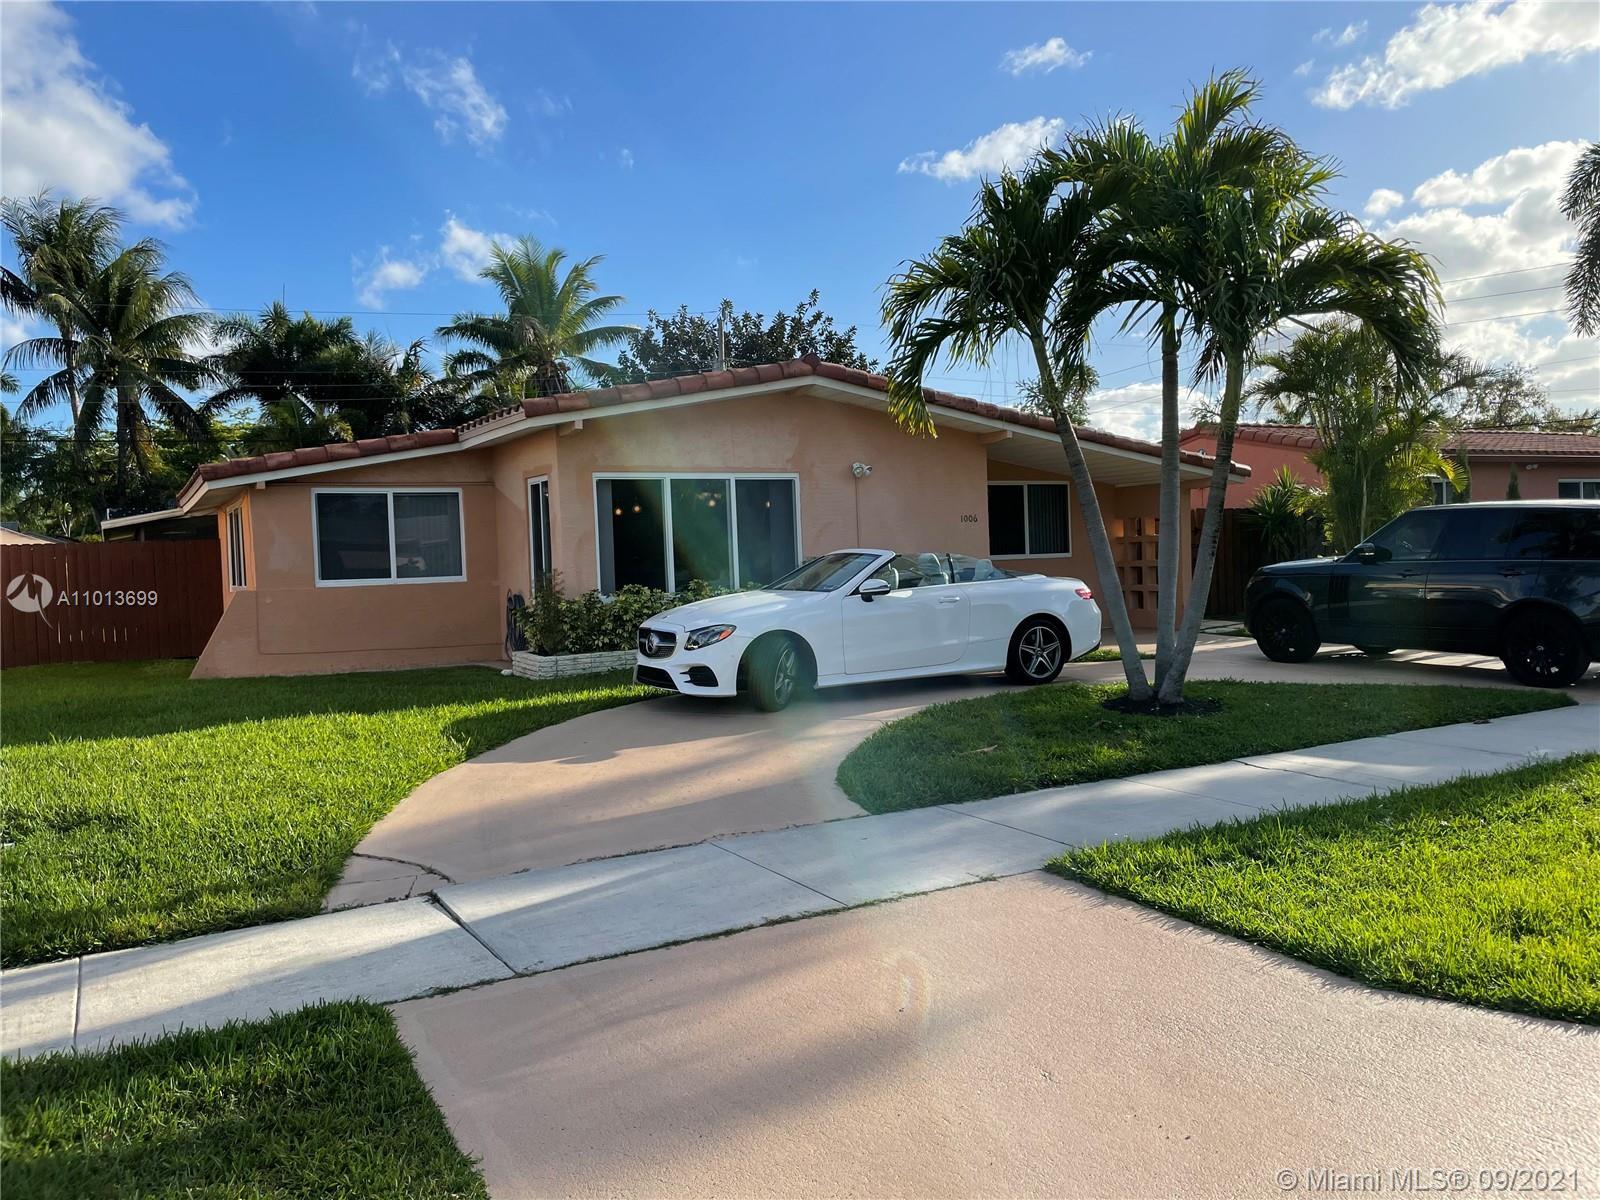 1006 6th St, Hallandale Beach, Florida 33009